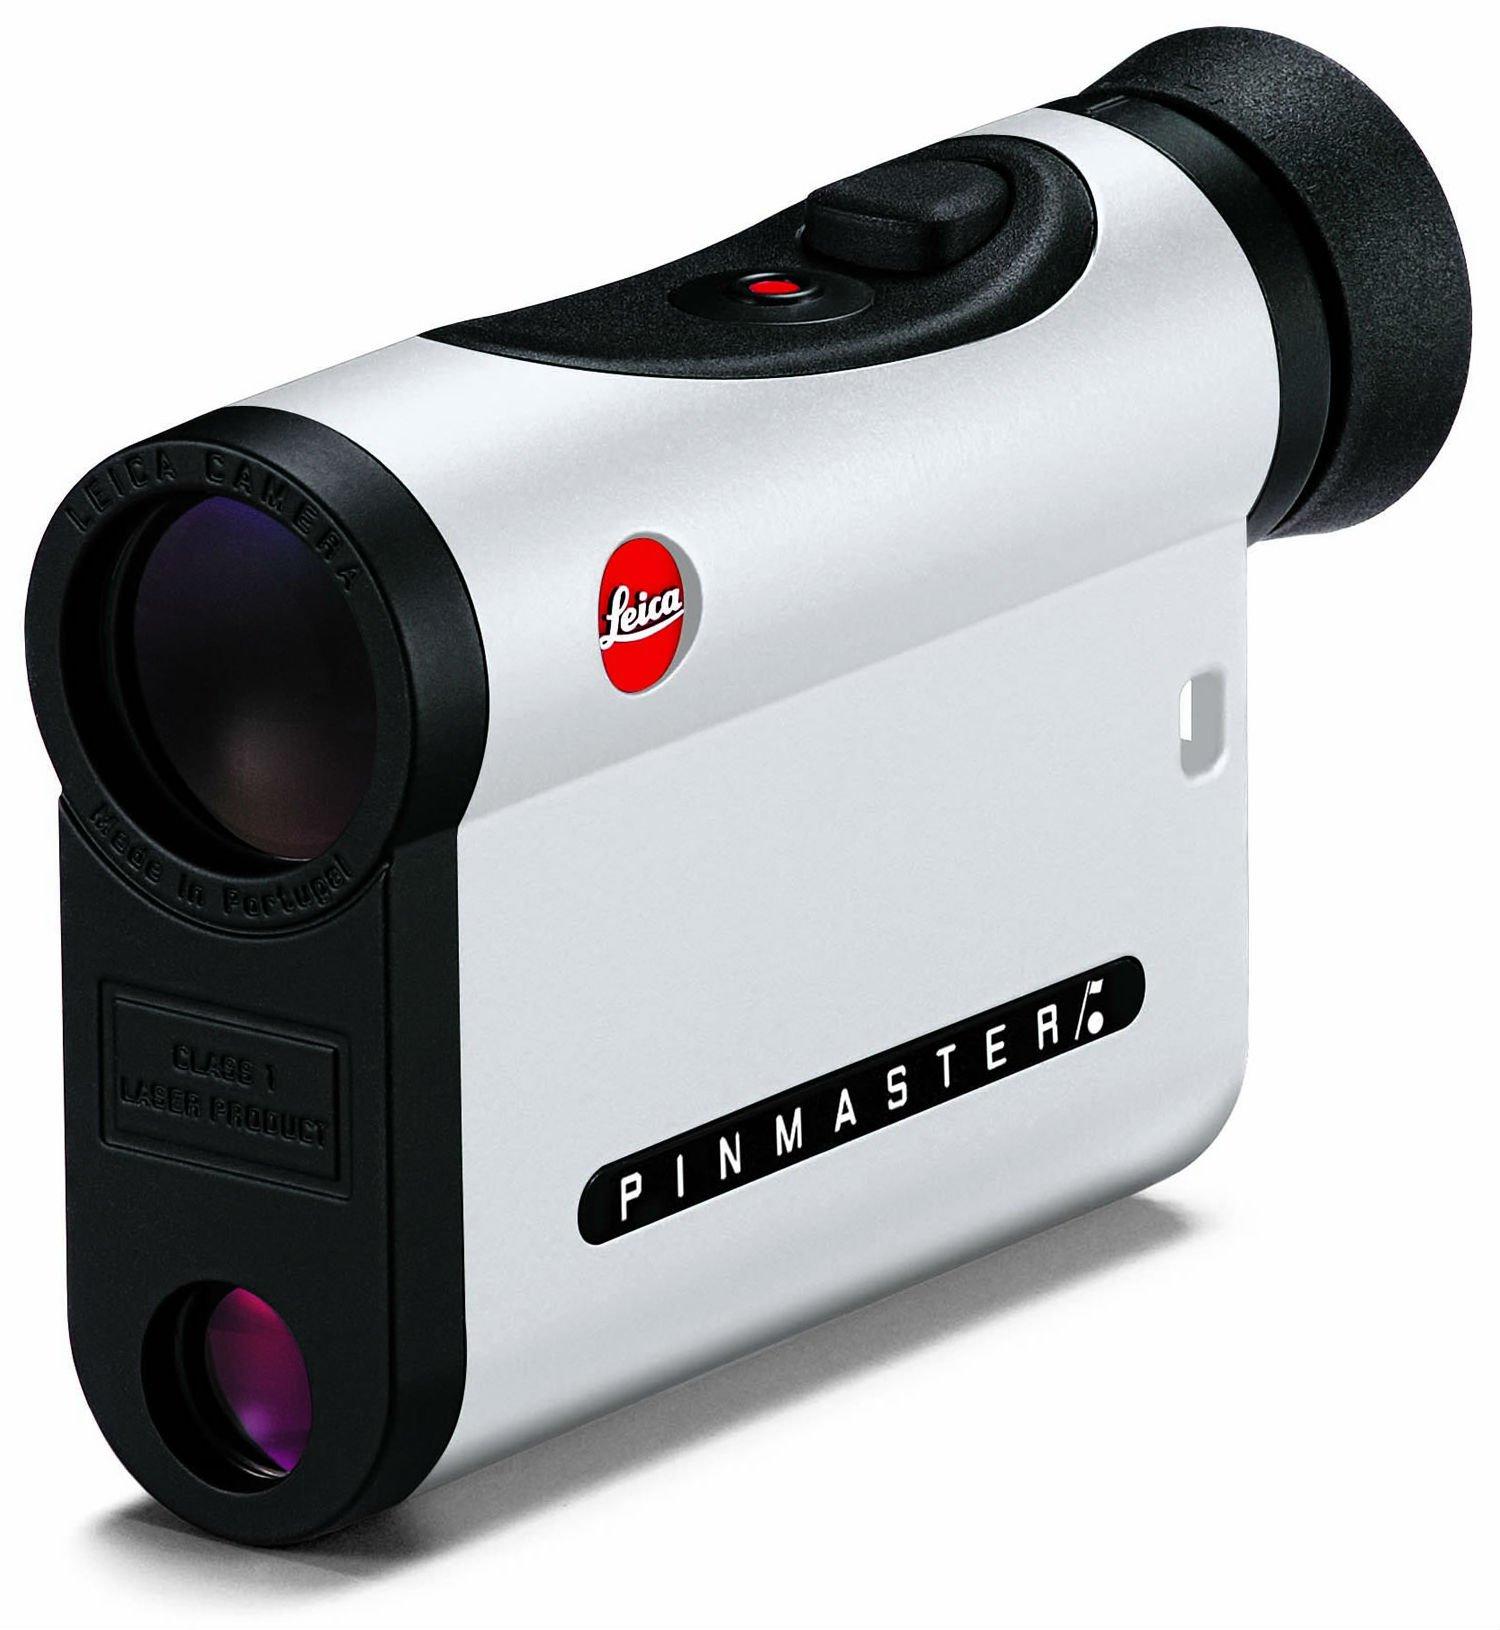 Дальномер Leica Pinmaster II